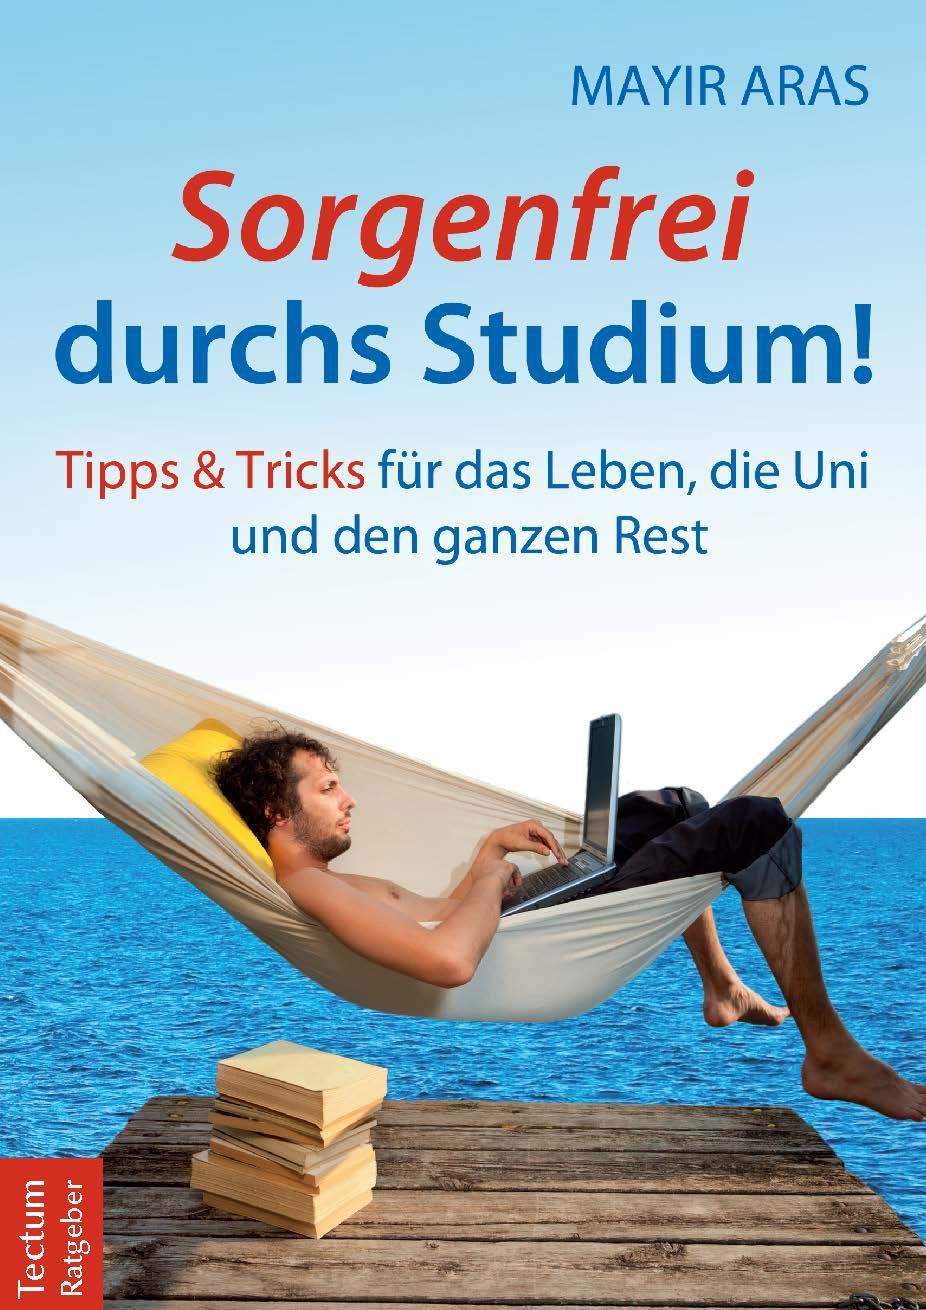 http://www.buchszene.de/wp-content/uploads/2014/07/Tectum_Leseprobe_Aras_Studium.pdf